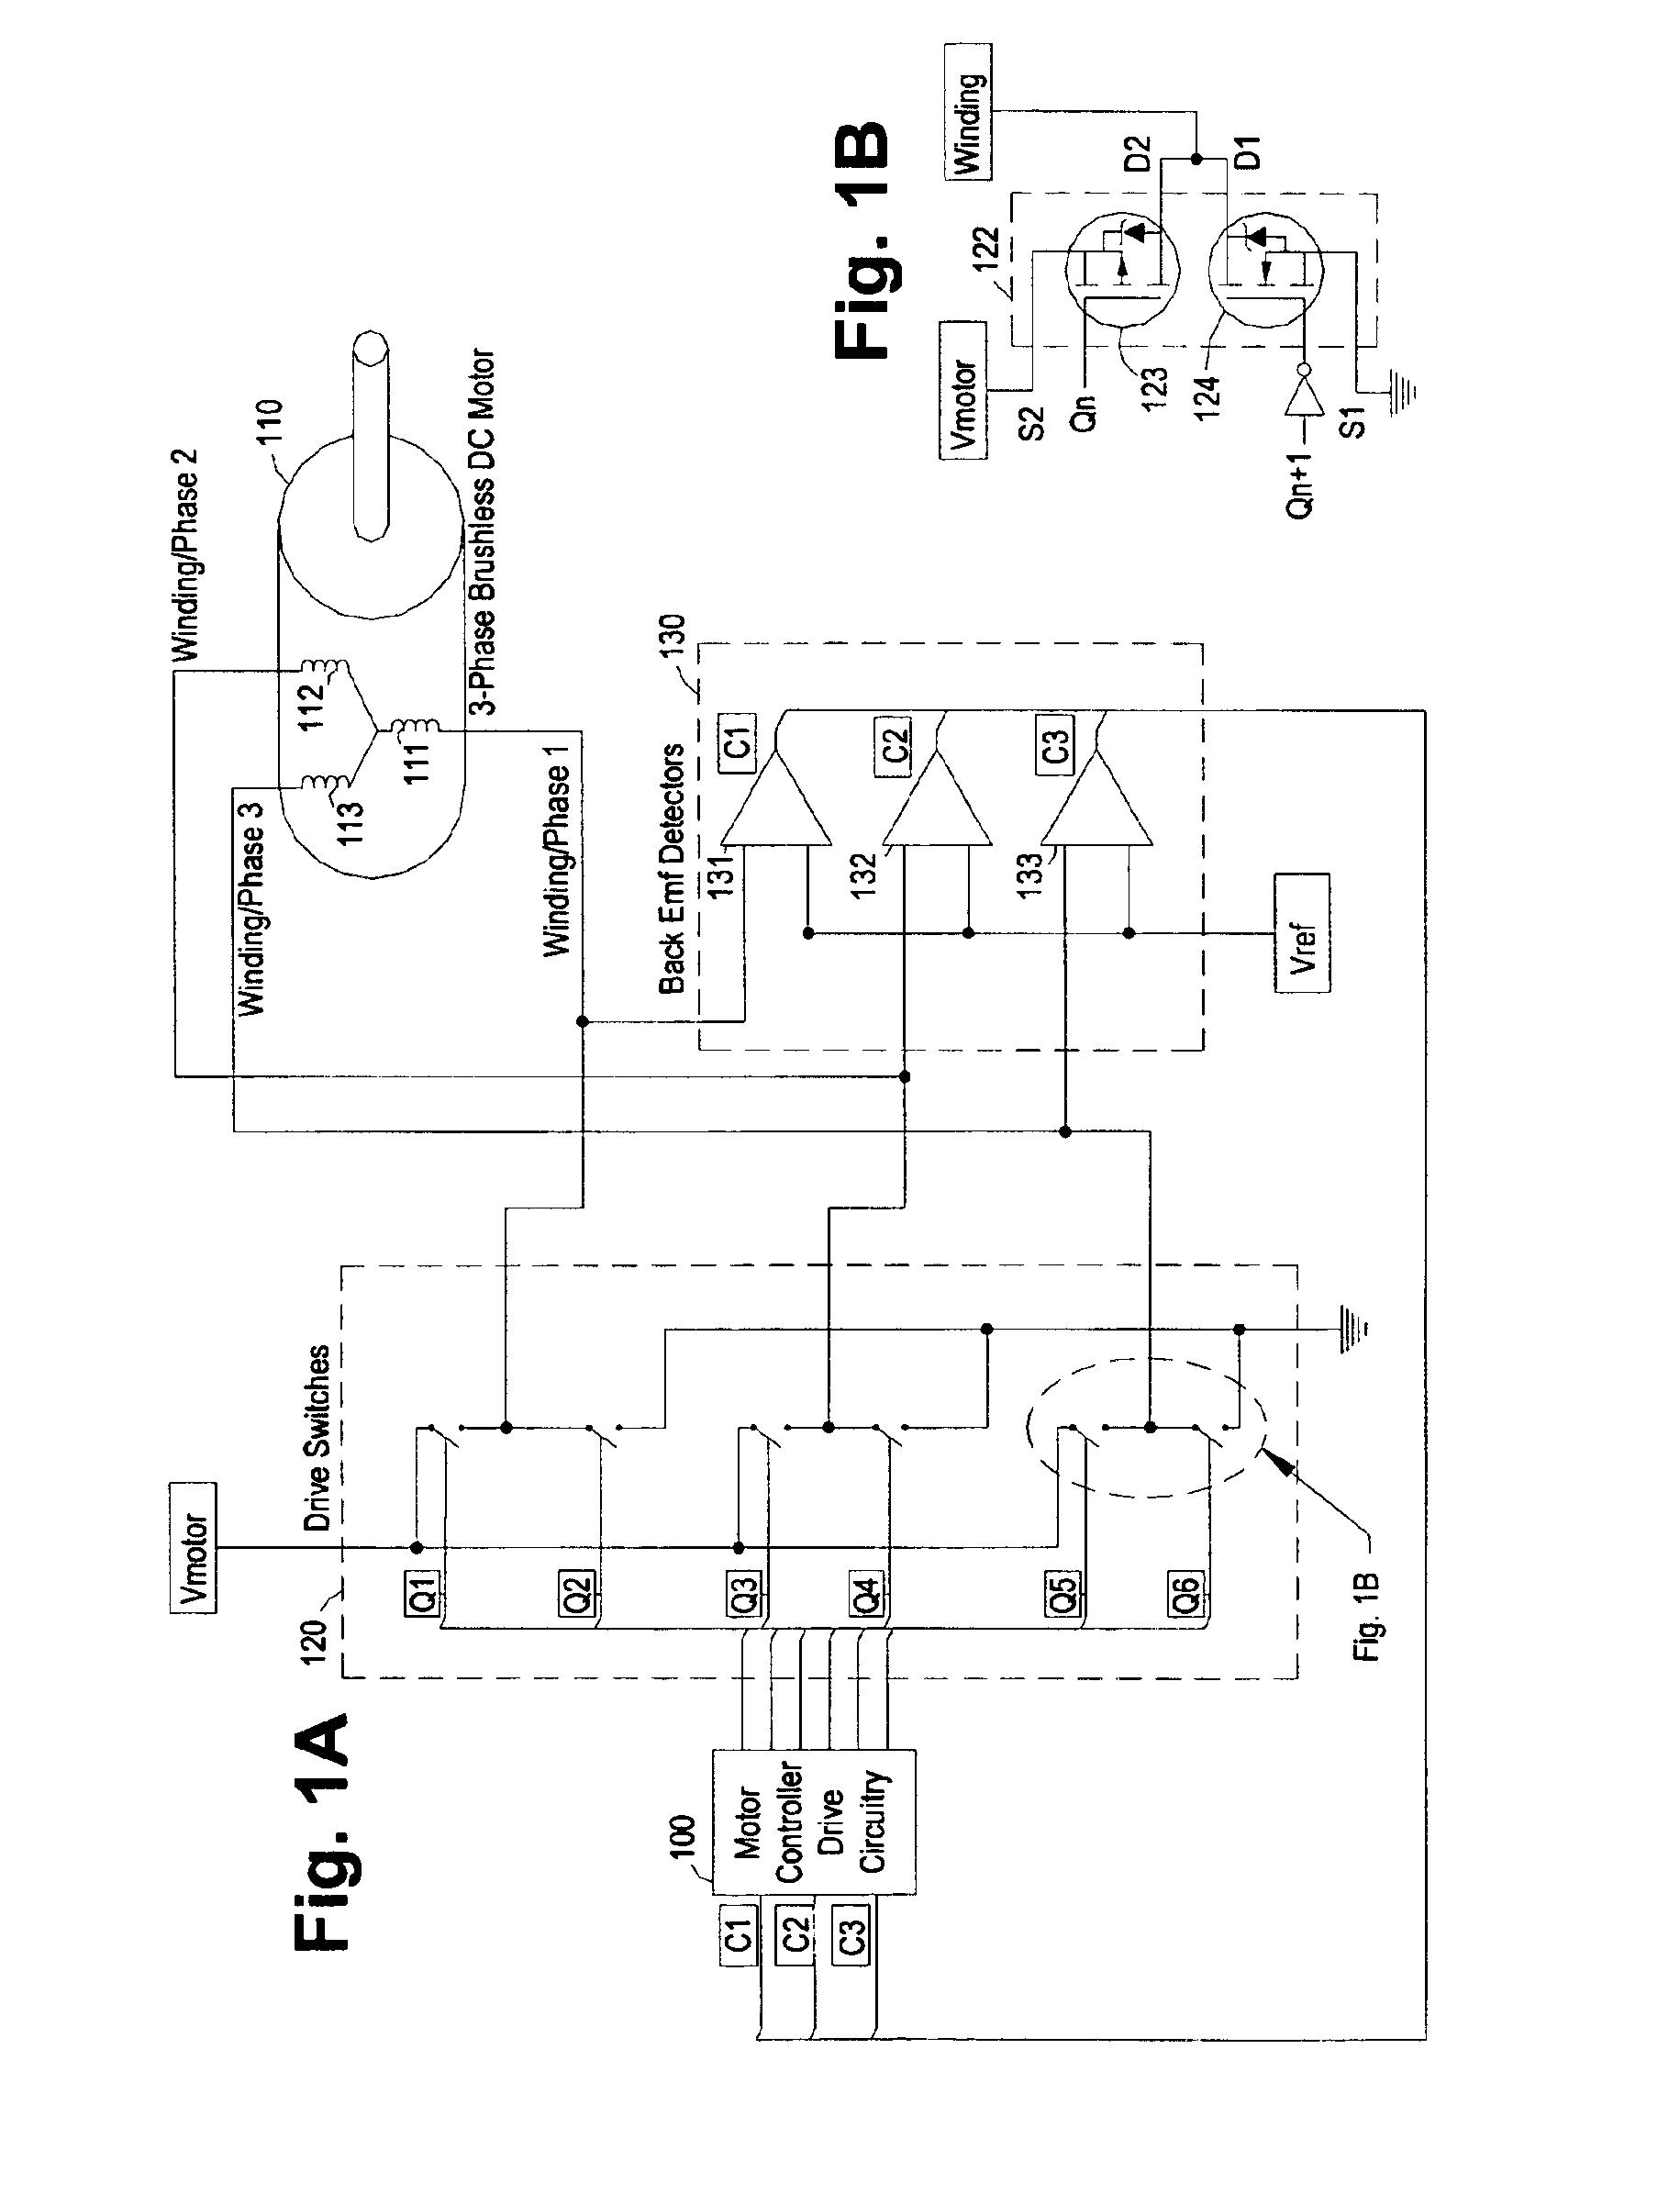 Patent Us7030582 Digital Adaptive Sensorless Commutational Drive Watchdog Circuit Diagram Electronic Diagrams Schematics Drawing